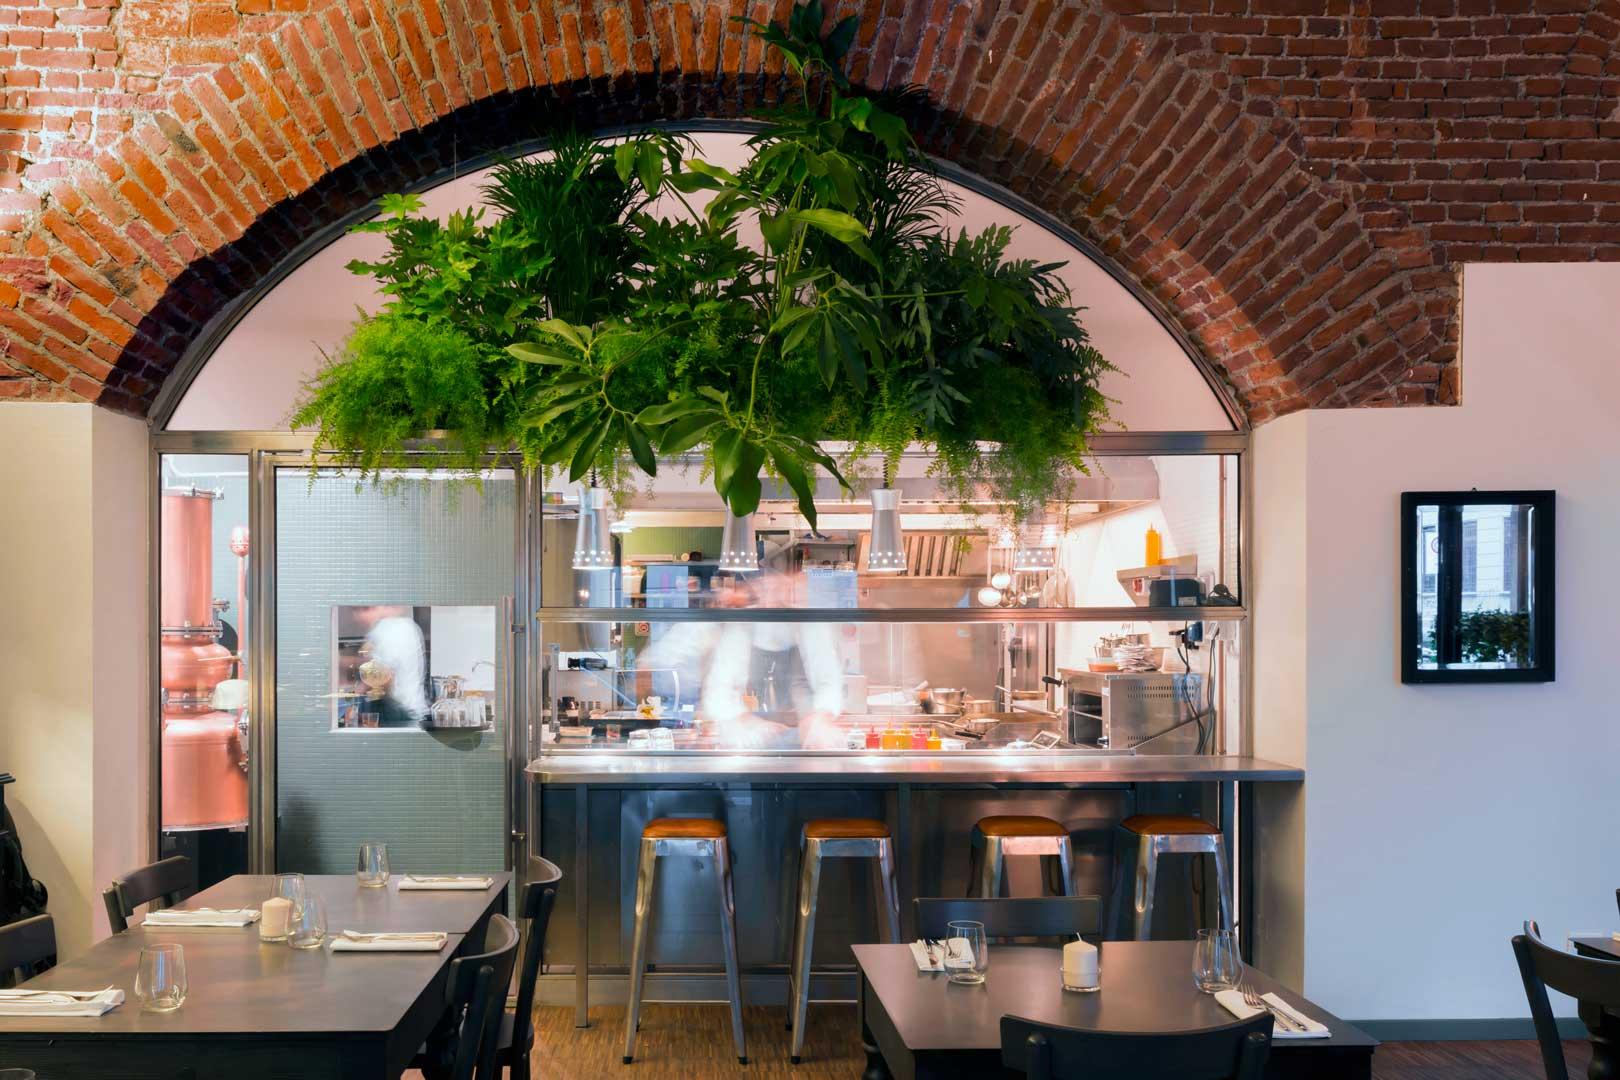 The botanical club flawless milano the lifestyle guide - La piccola cucina milano ...